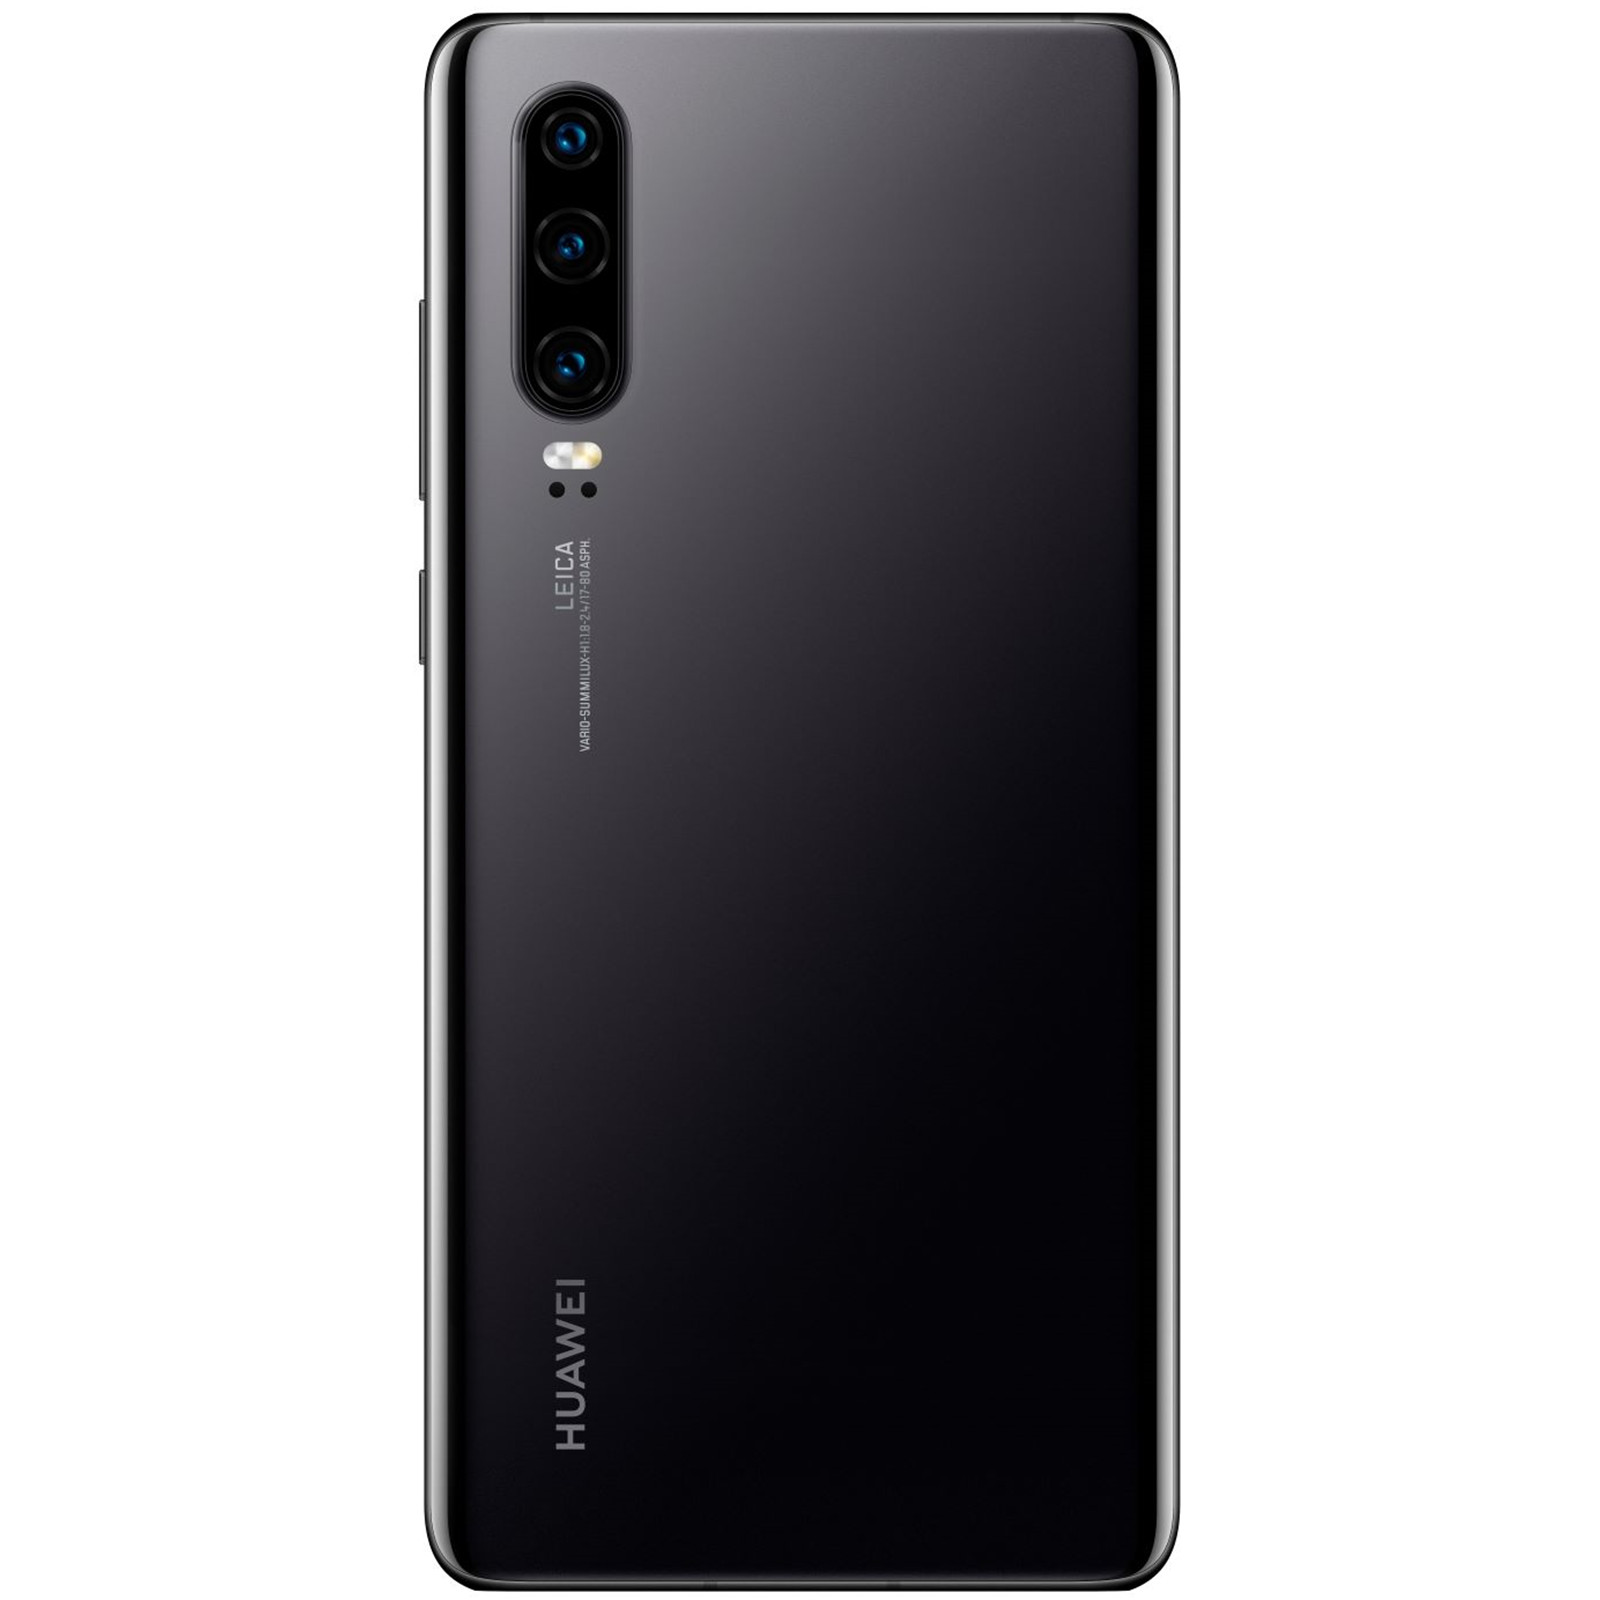 Buy the Huawei P30 6GB+128GB Smartphone - Black - Bonus JBL